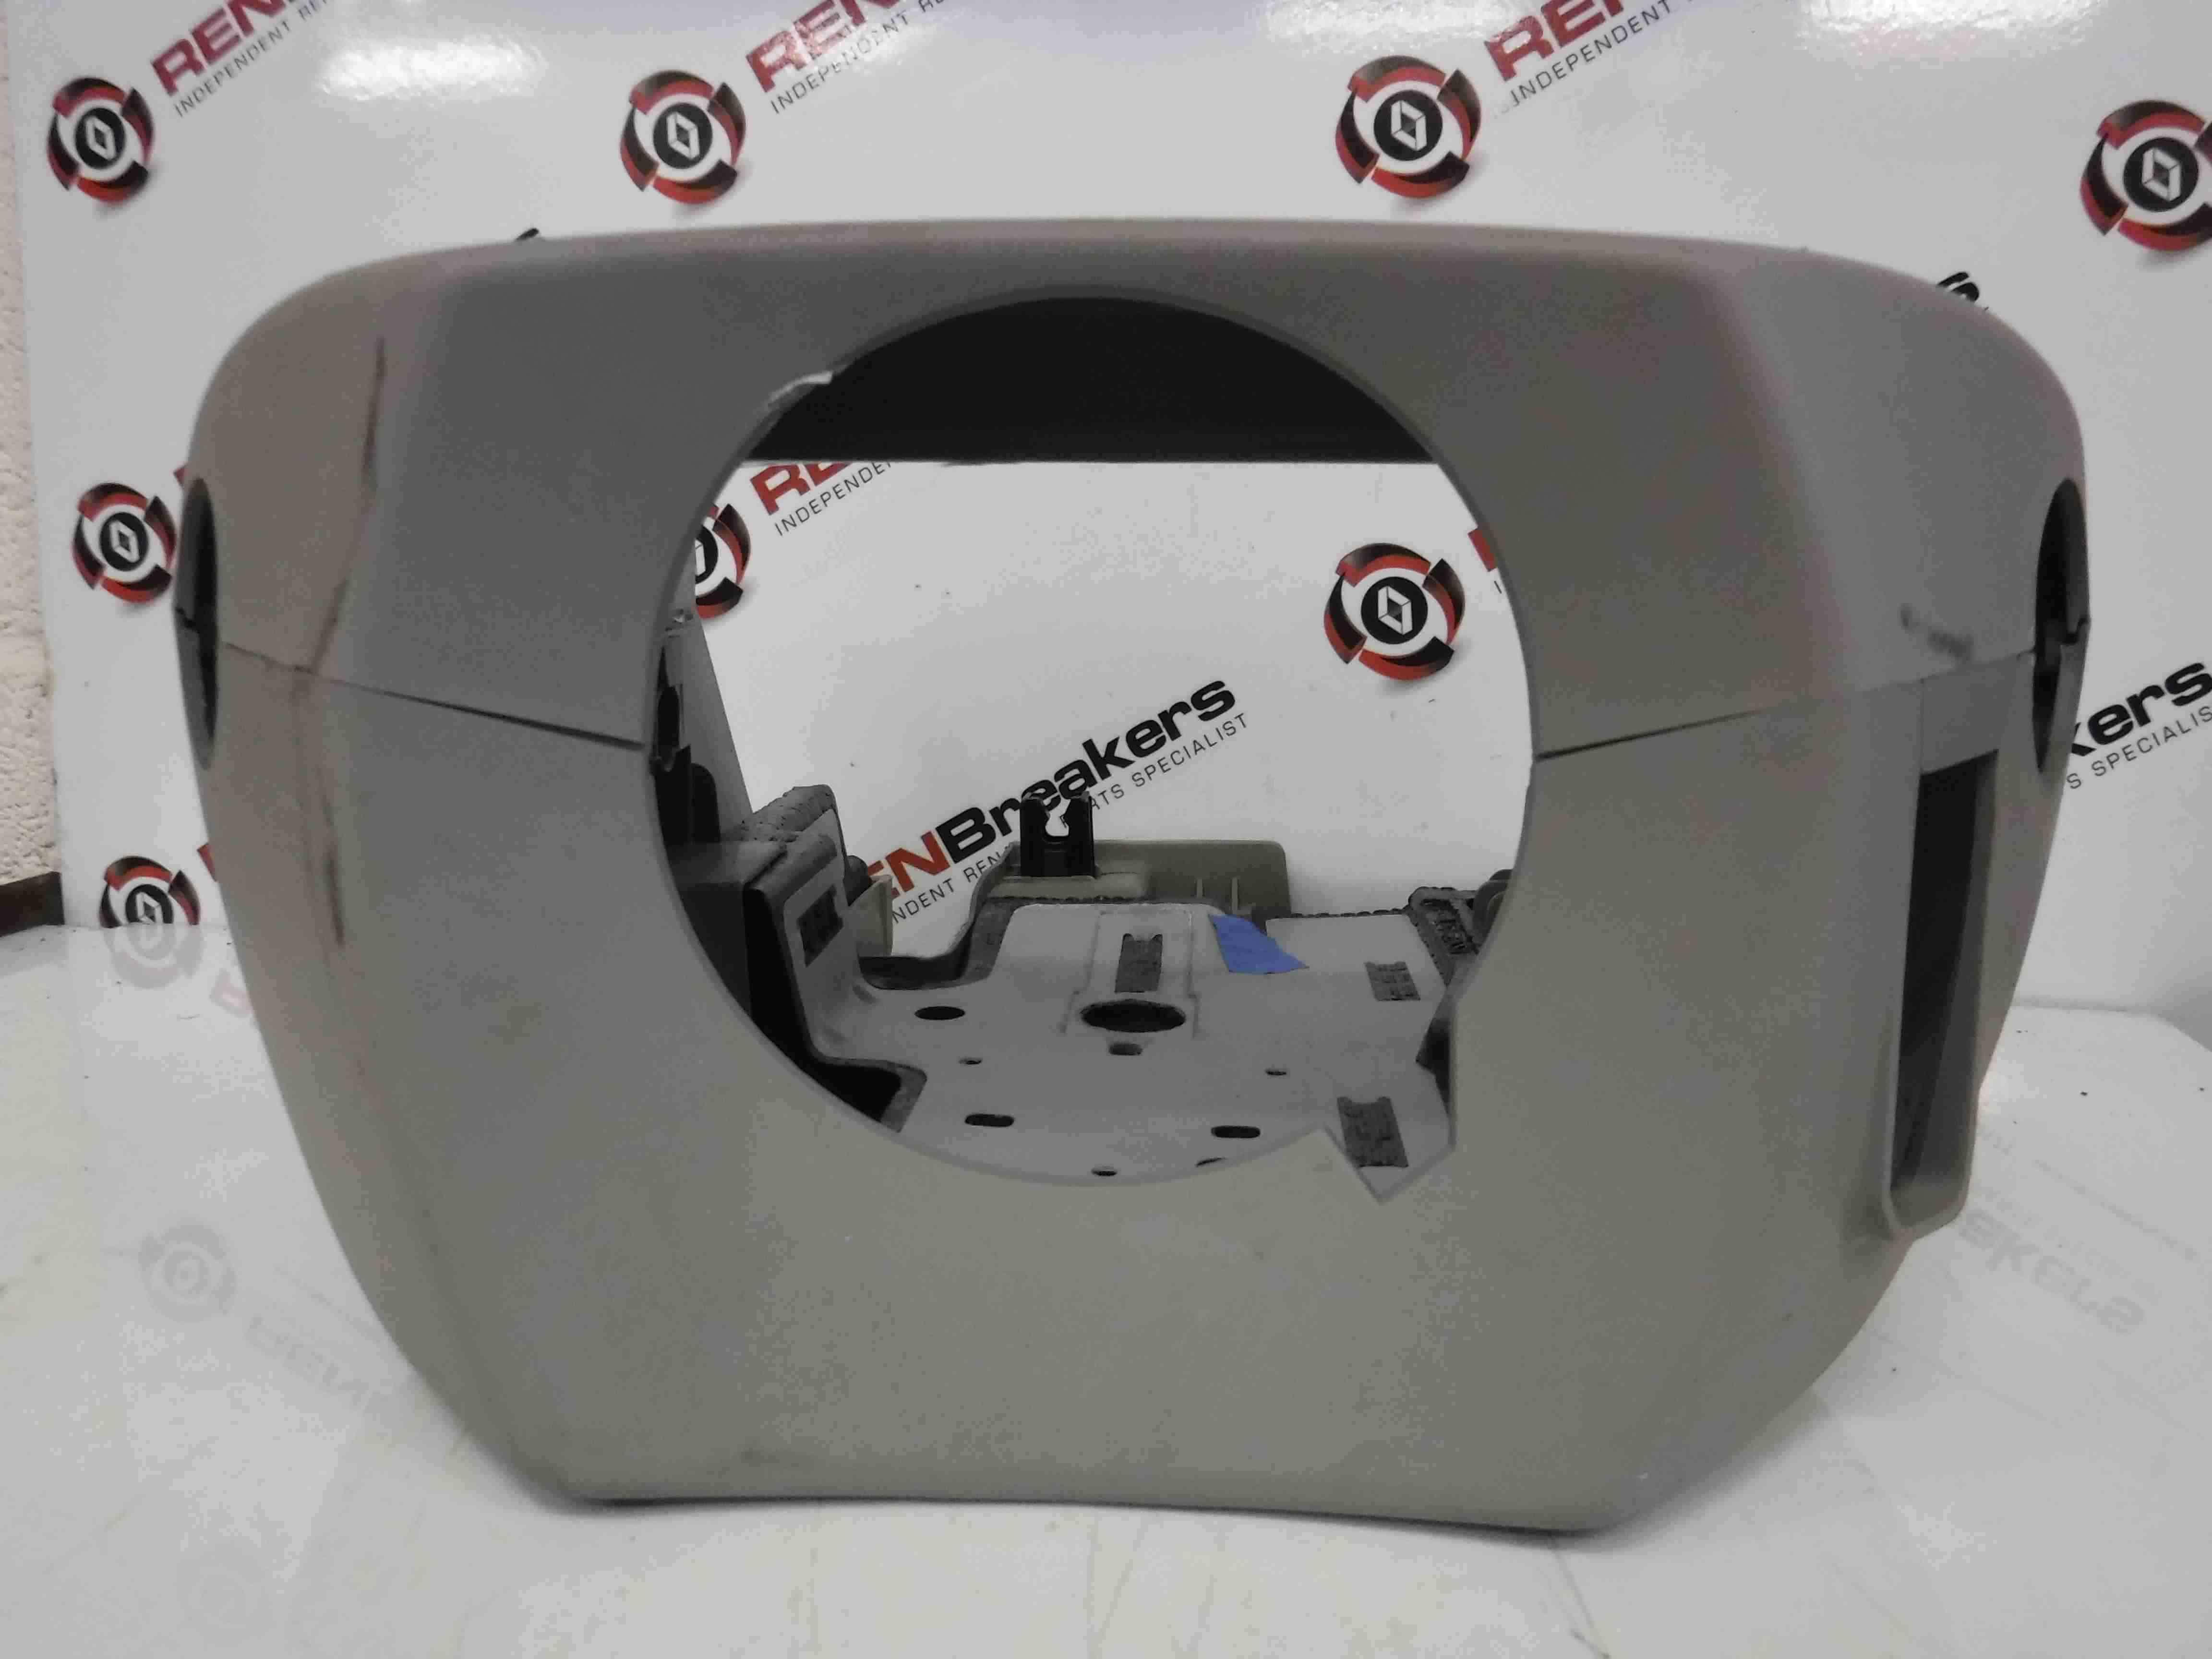 Renault Zoe 2012-2016 Steering Wheel Surround Cowling